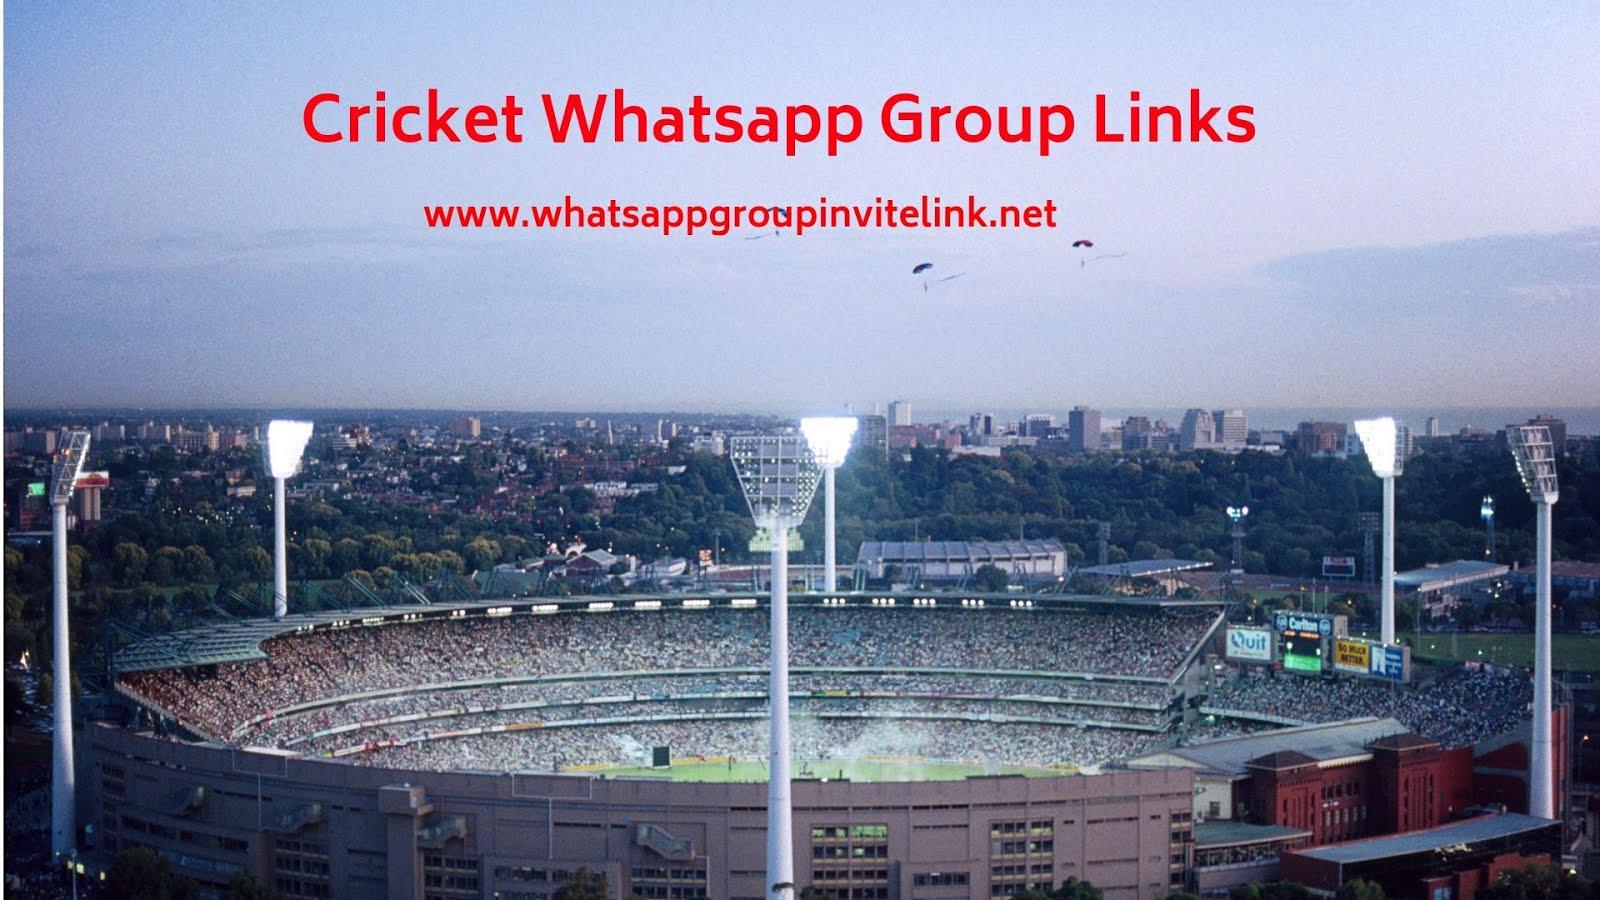 Whatsapp Group Invite Links: Cricket Whatsapp Group Links